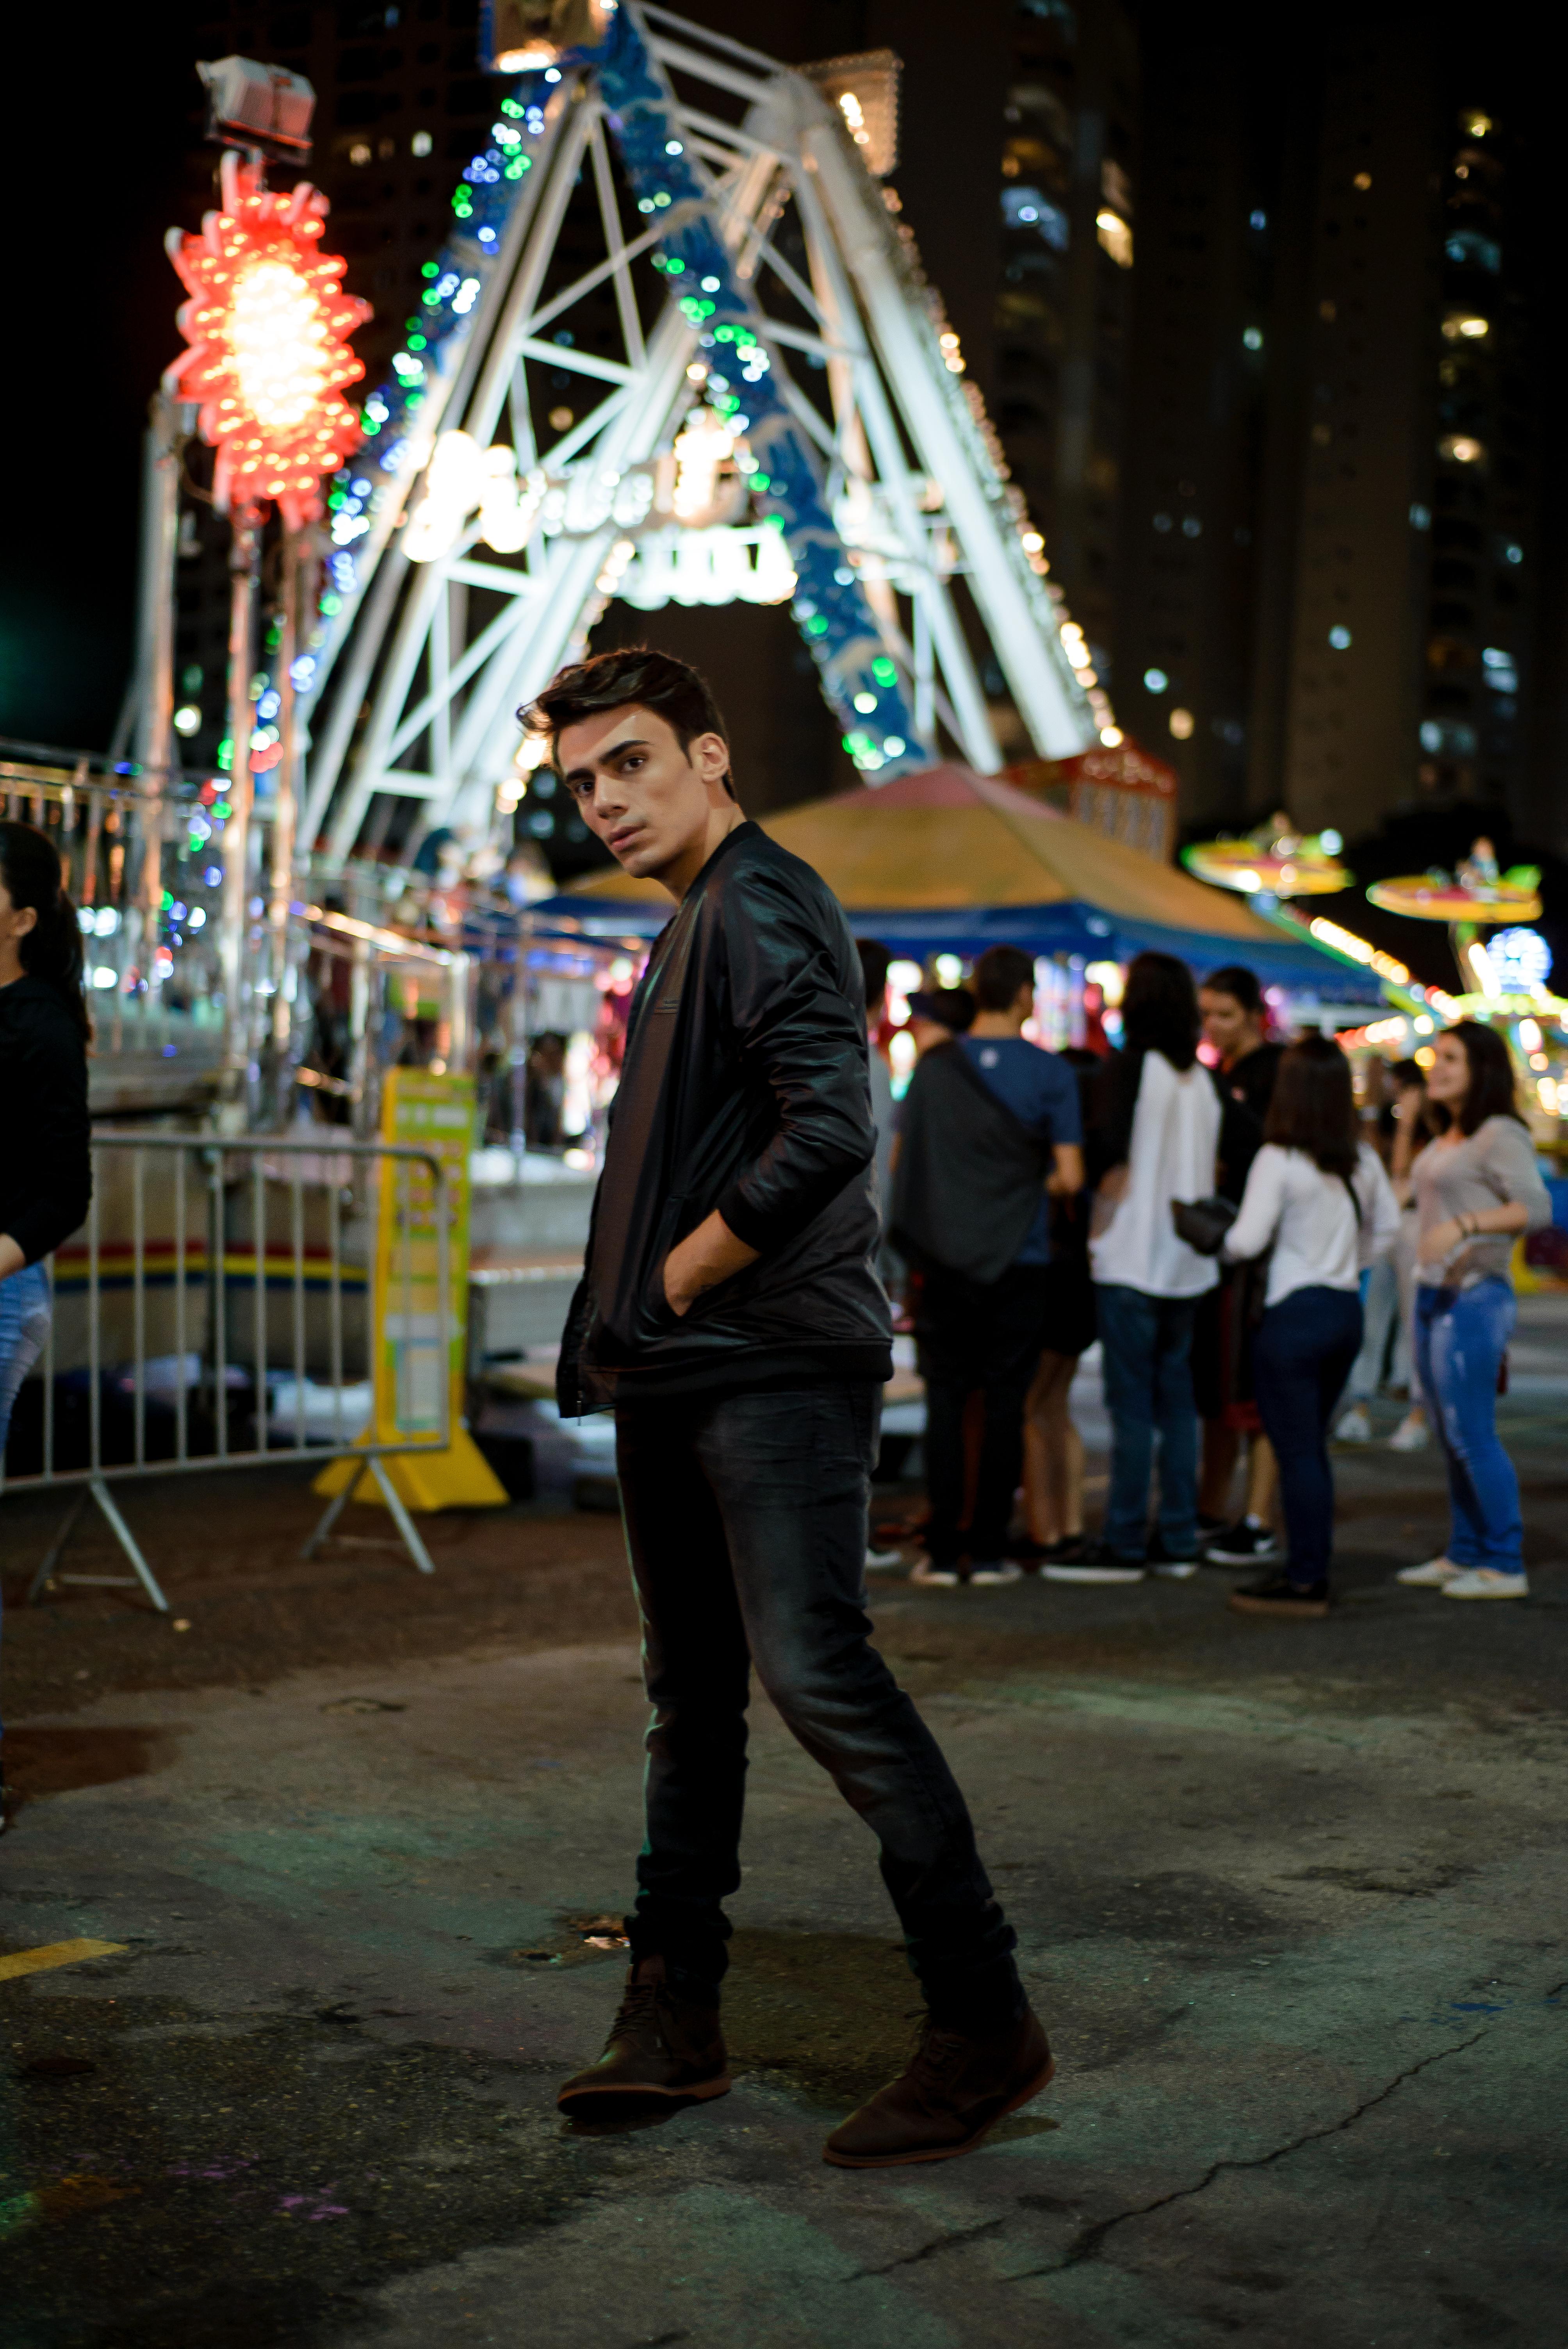 alex cursino, blogueiro de moda masculina, blog de moda masculina, melhores blogueiros do brasil, rafaella santiago, jaqueta bomber masculina, jaqueta jeans masculina, roupa masculina inverno (5)